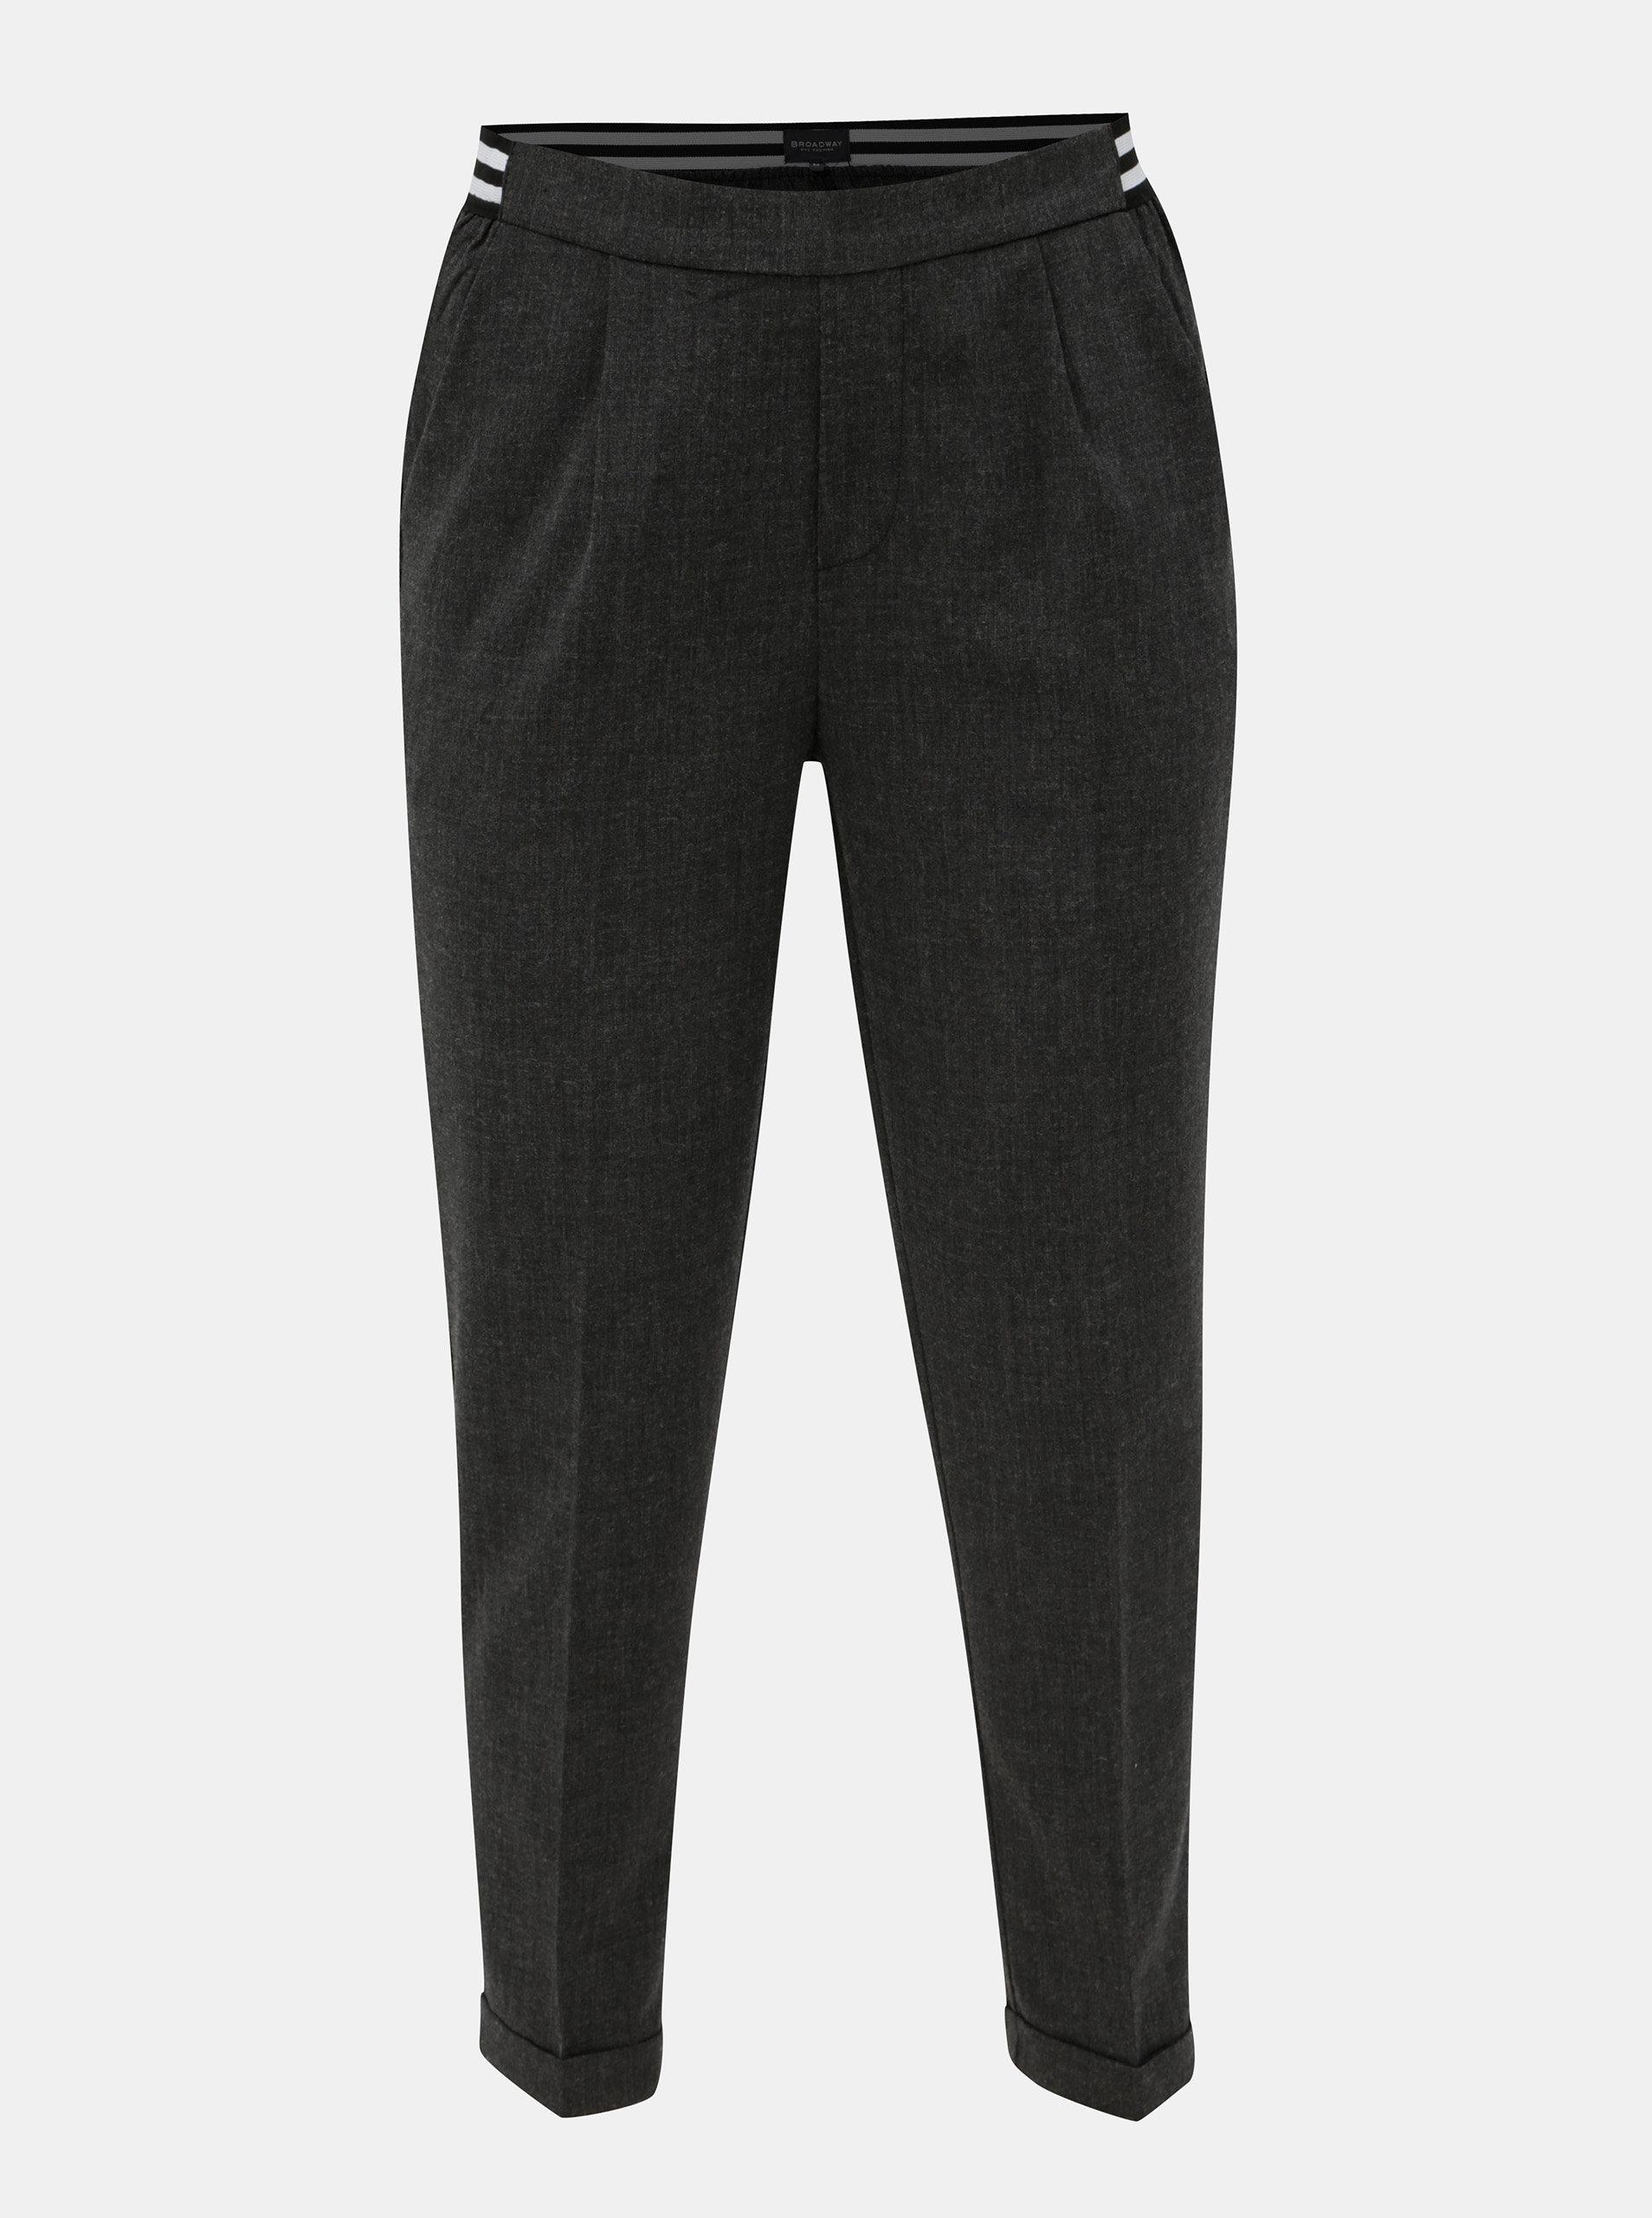 3c262f6c5ff3 Sivé dámske skrátené nohavice s elastickým pásom Broadway Gabby ...